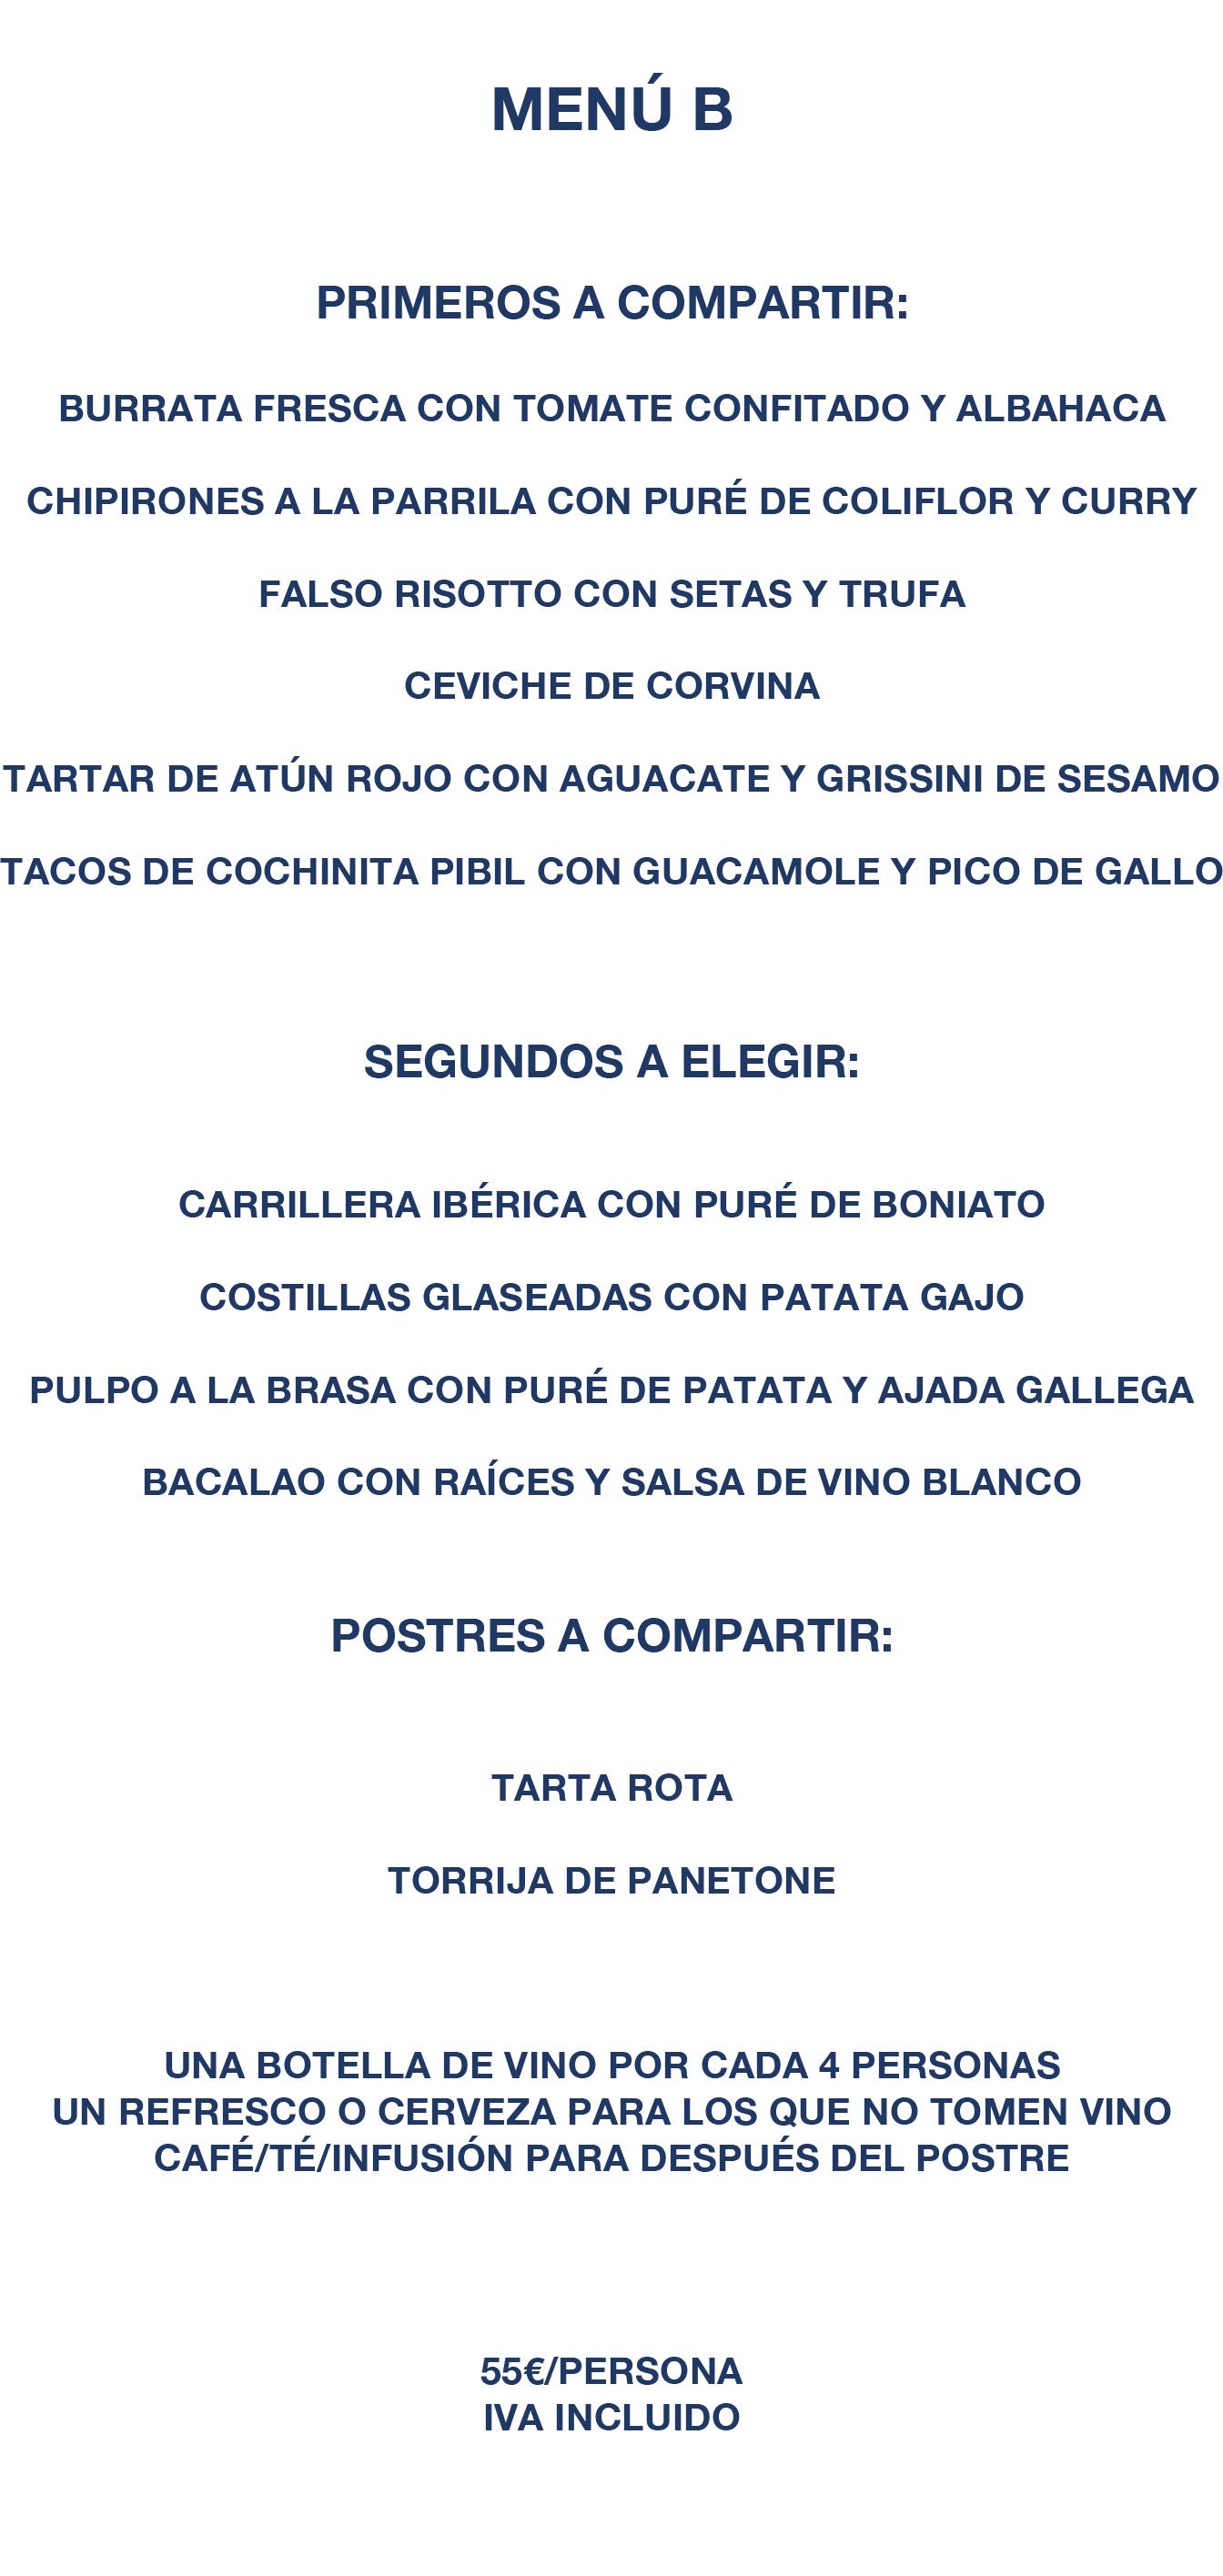 menu_new_b